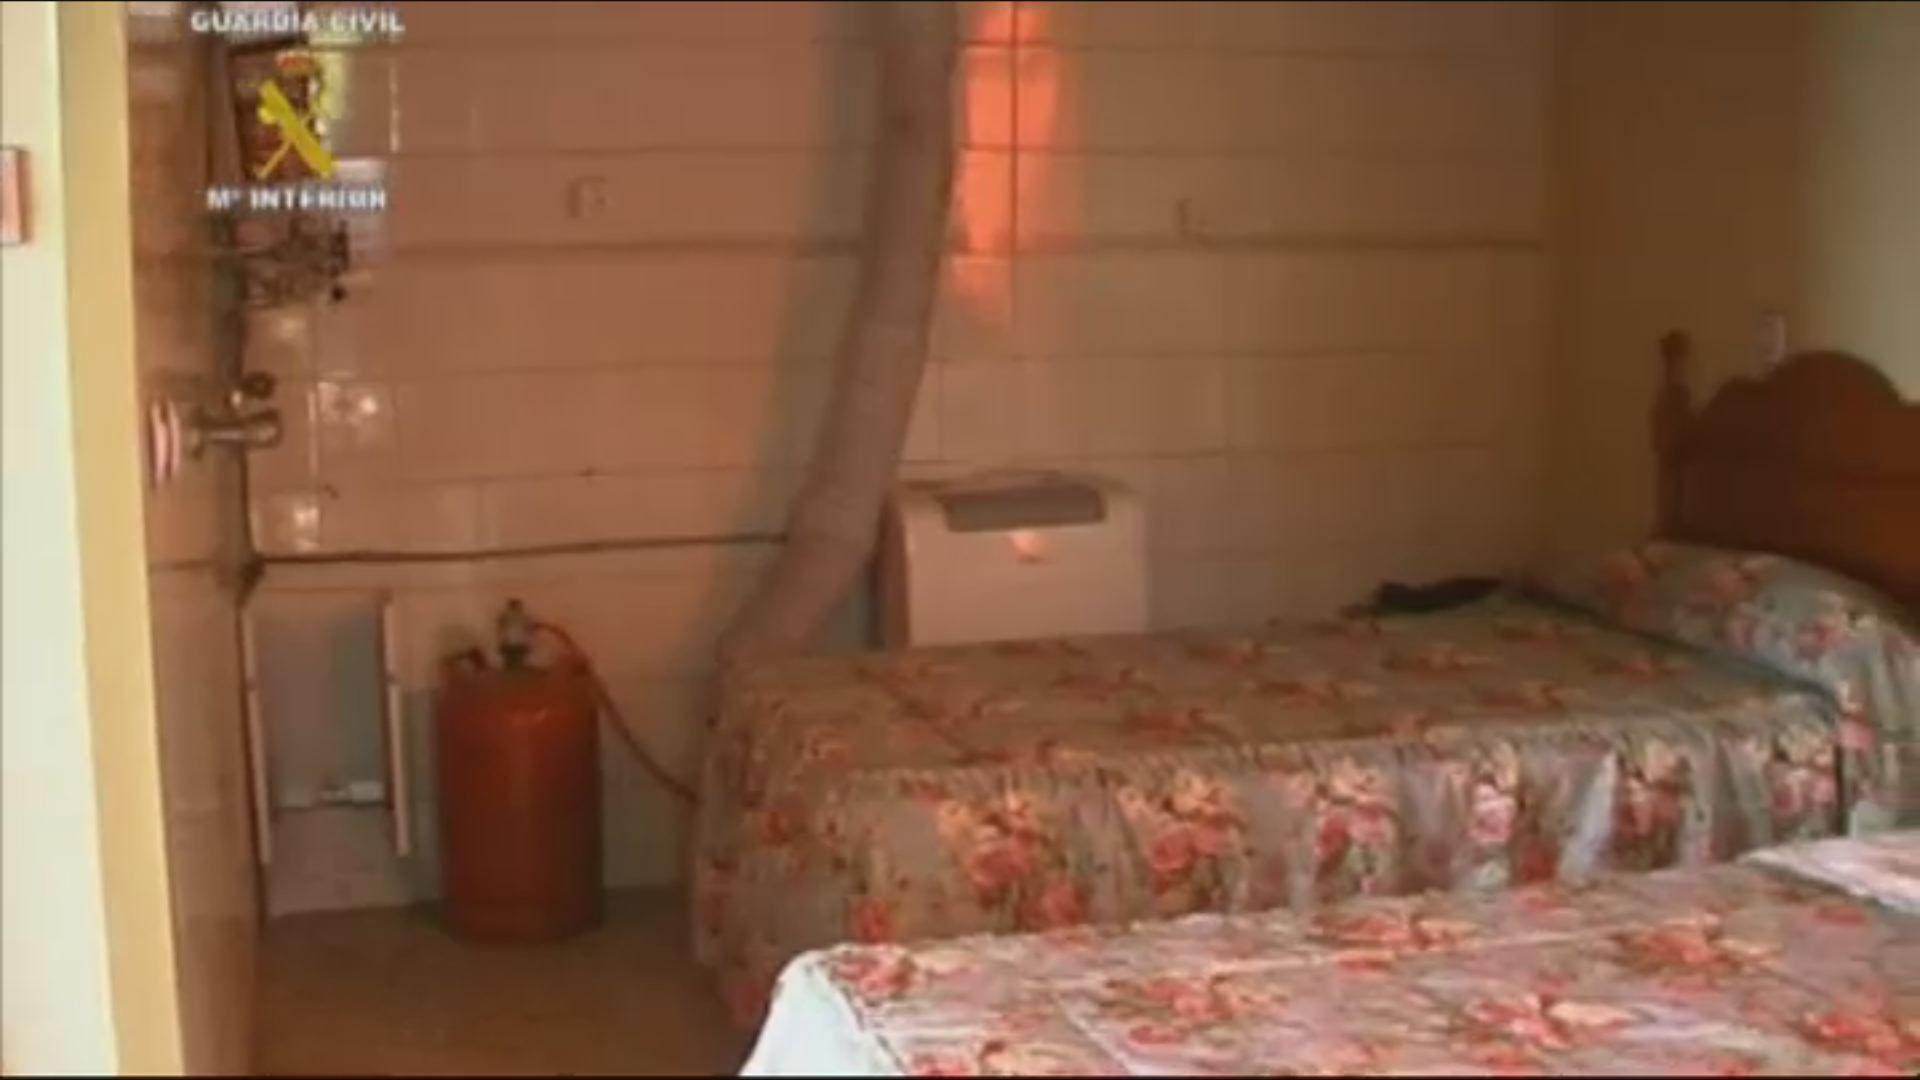 Así era la casa de los horrores de Cádiz